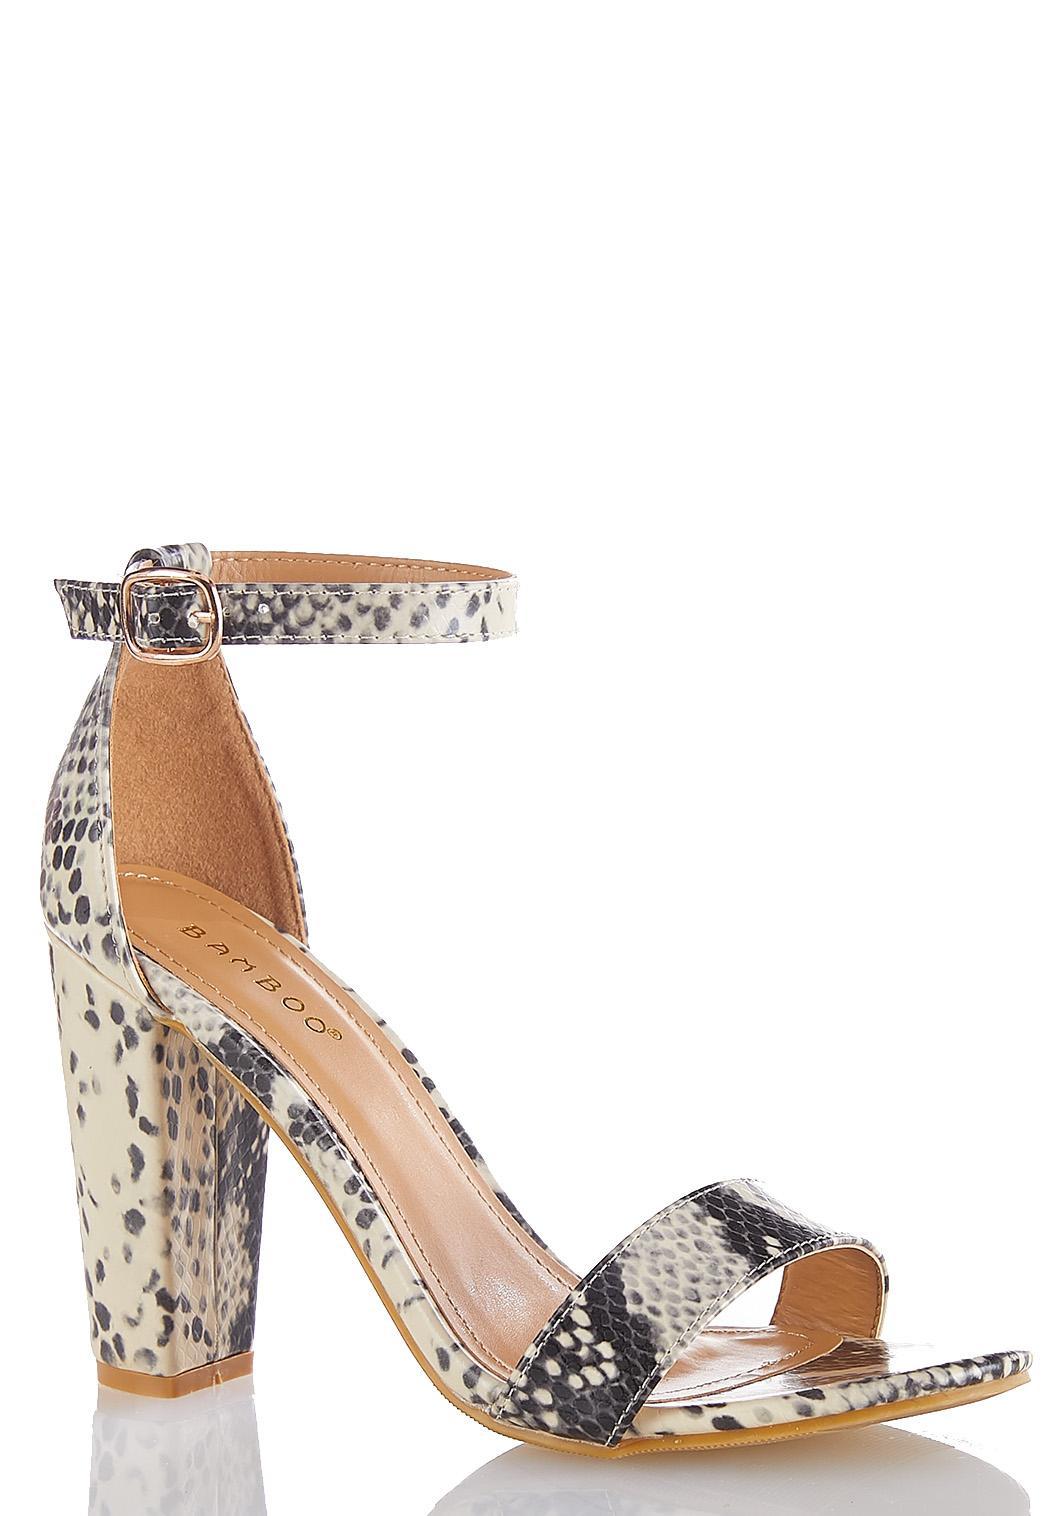 5e1e4c1f67fc0 Women s Shoes - Boots